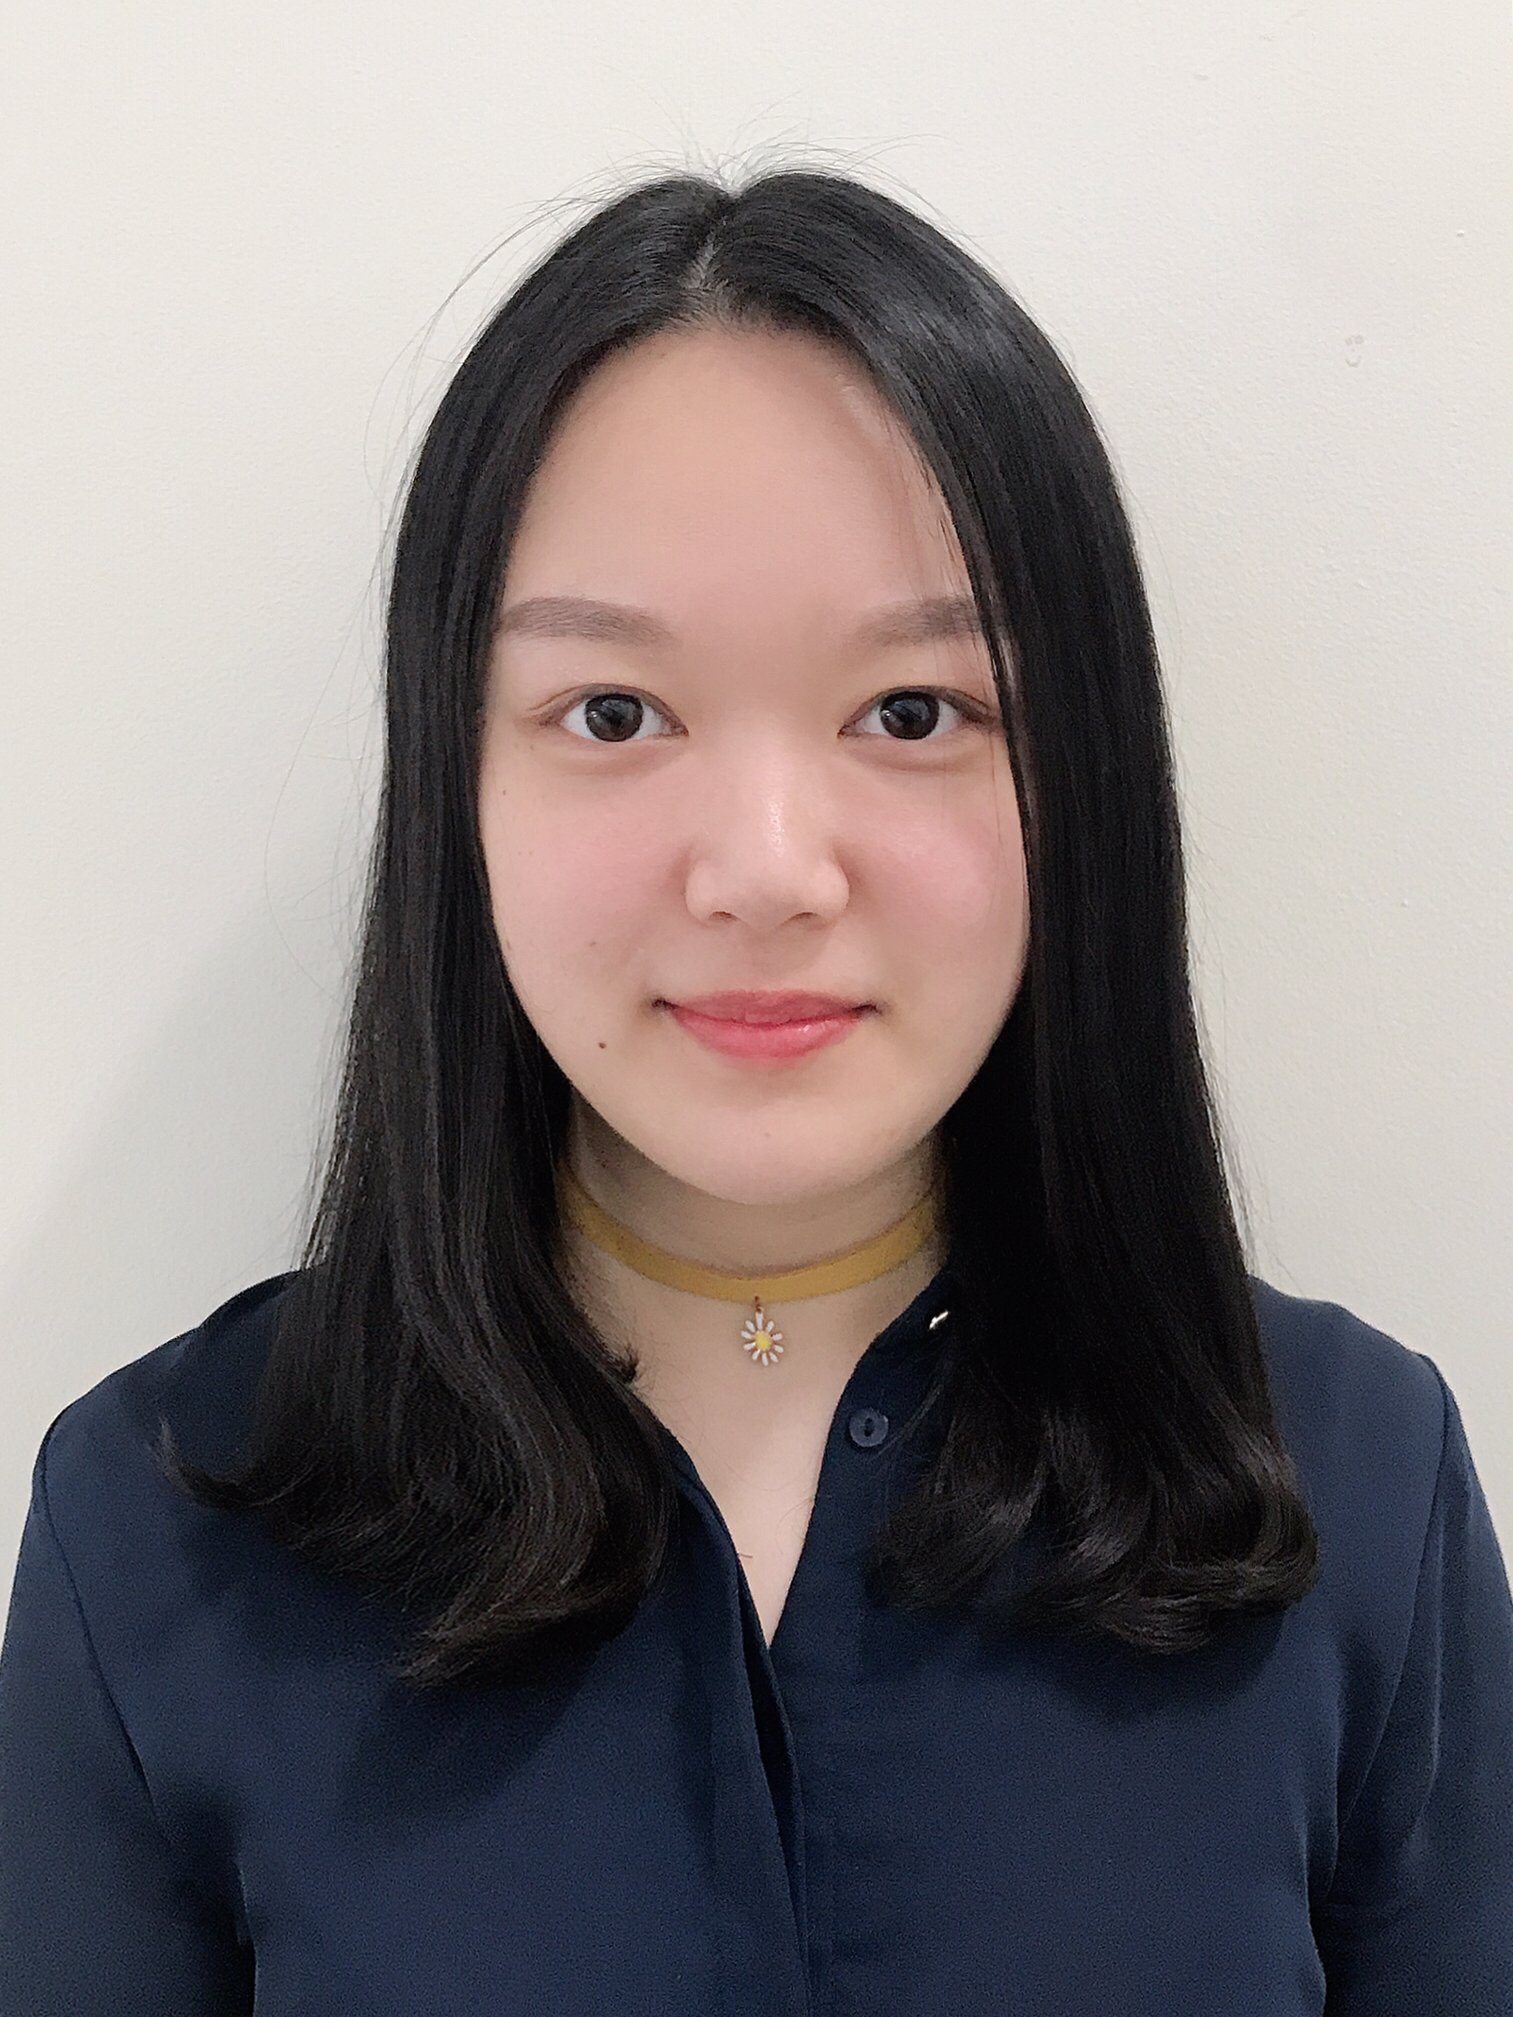 Luchen Li